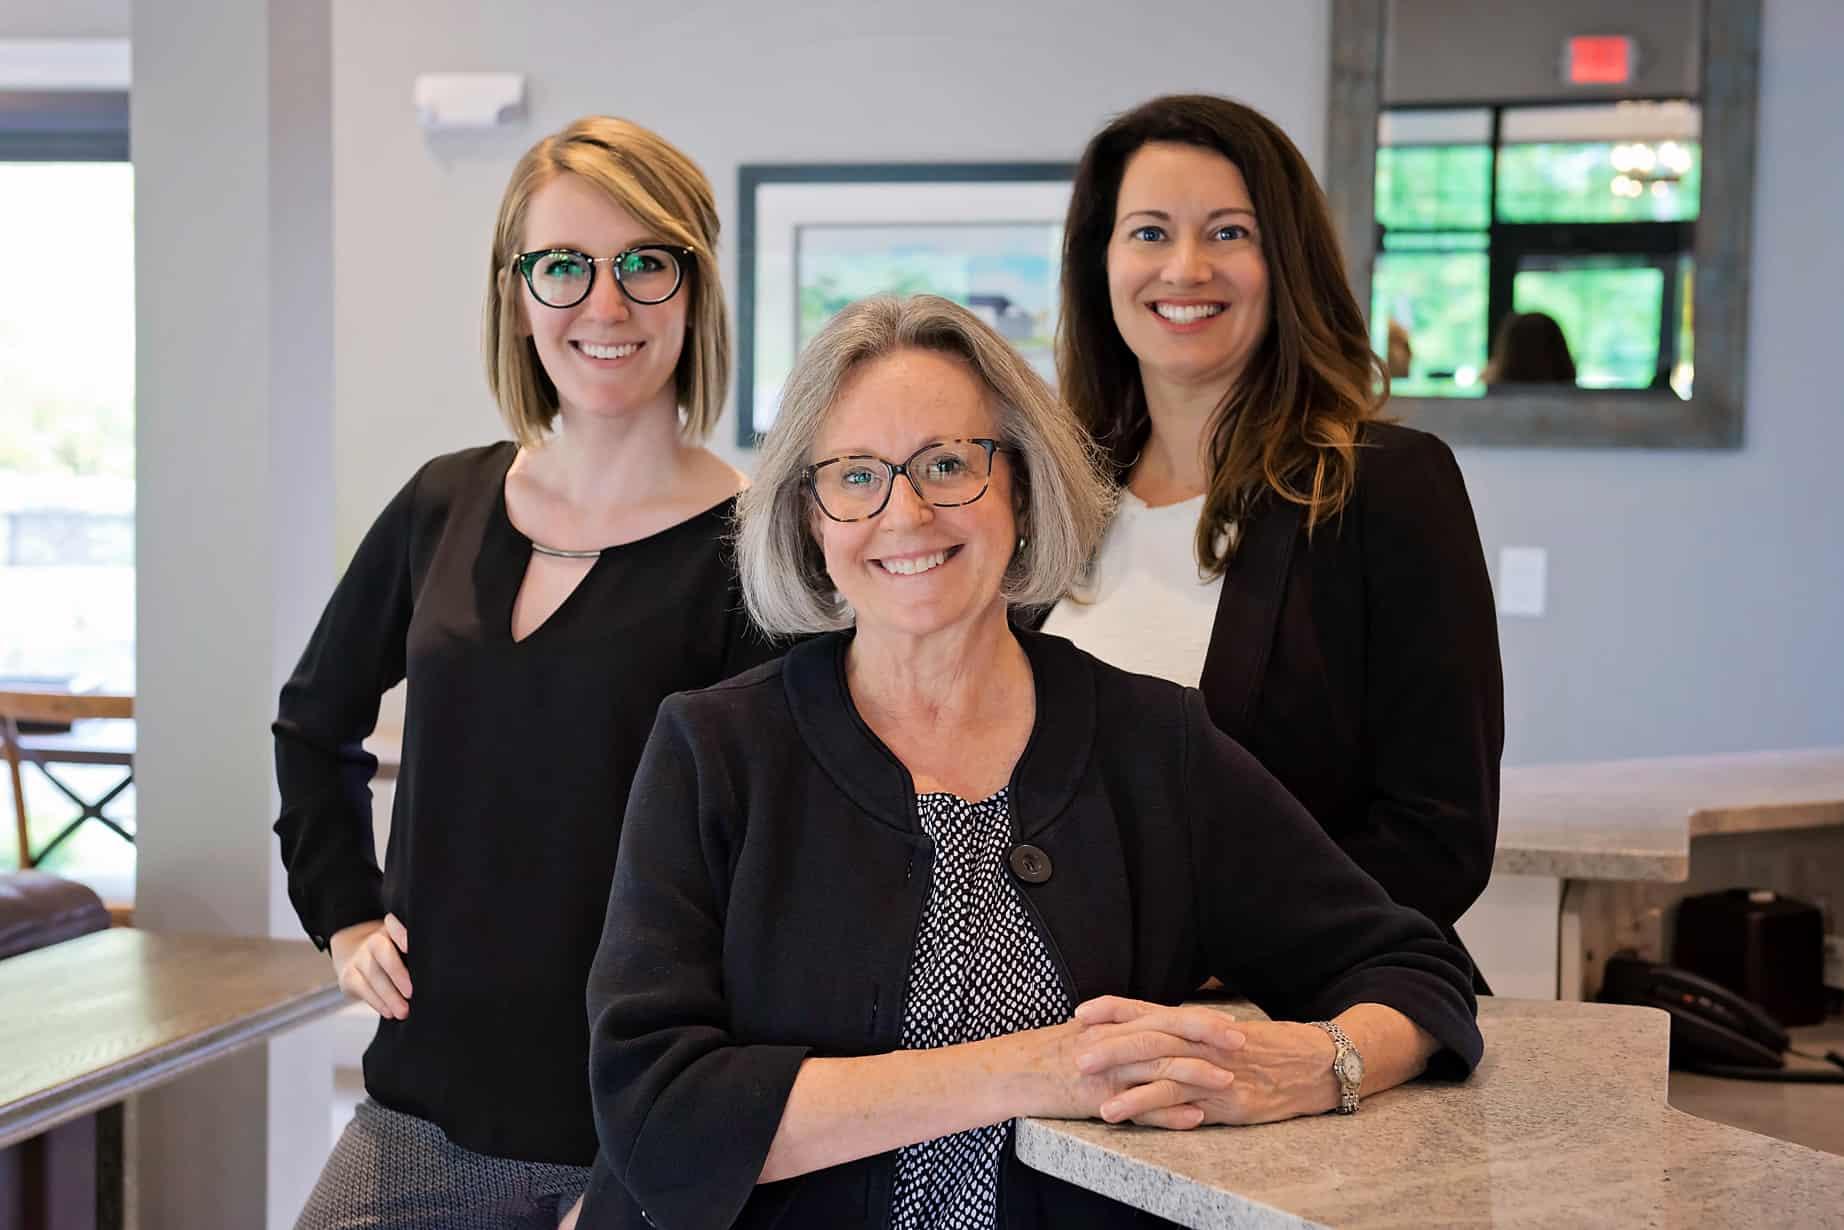 Cranberry Dental Studio | Our Office Administrators